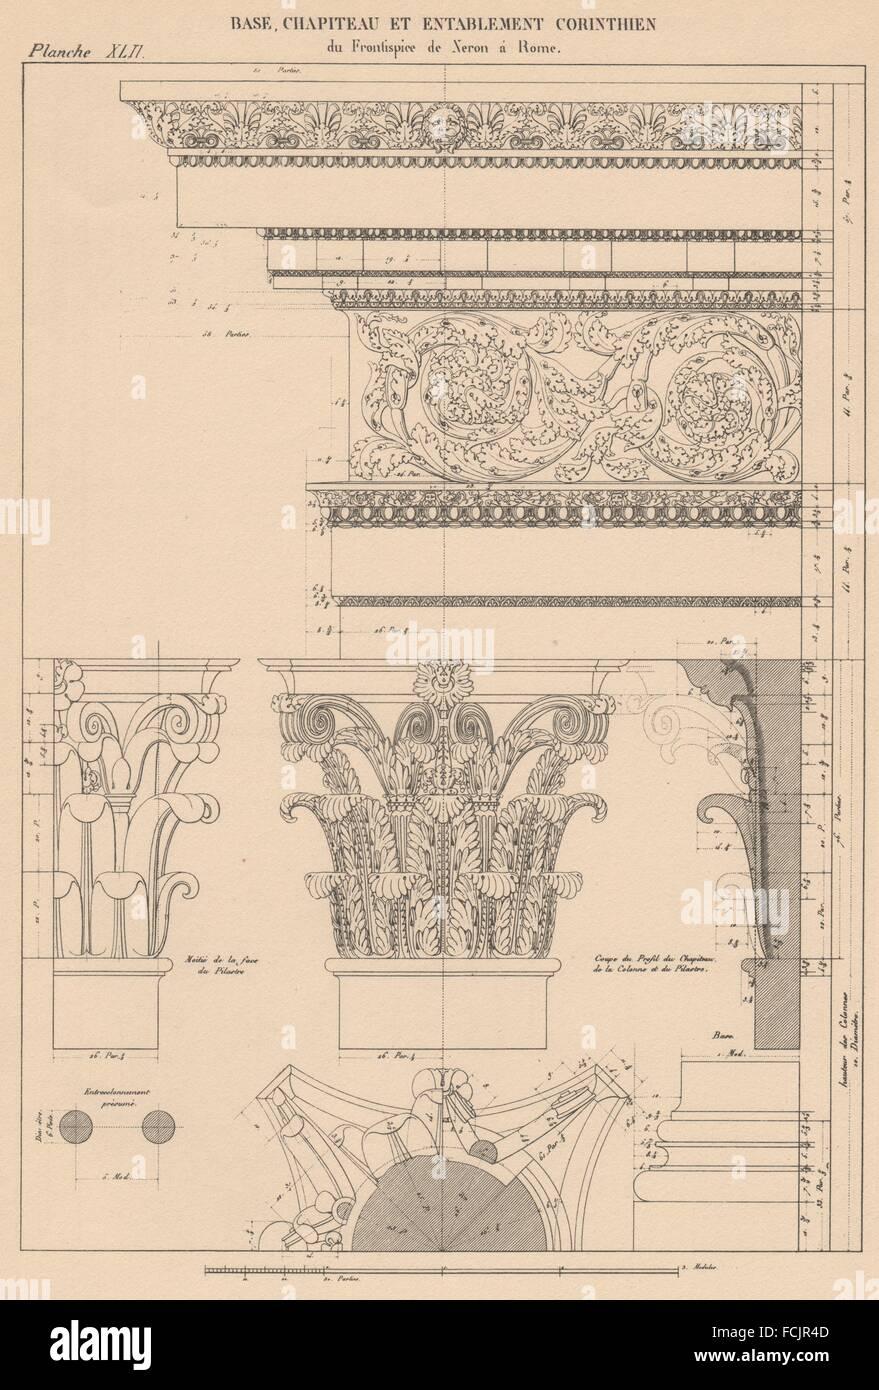 CORINTHIAN ARCHITECTURE: Frontispiece, Nero, Rome. Base Capital Entablature 1931 - Stock Image